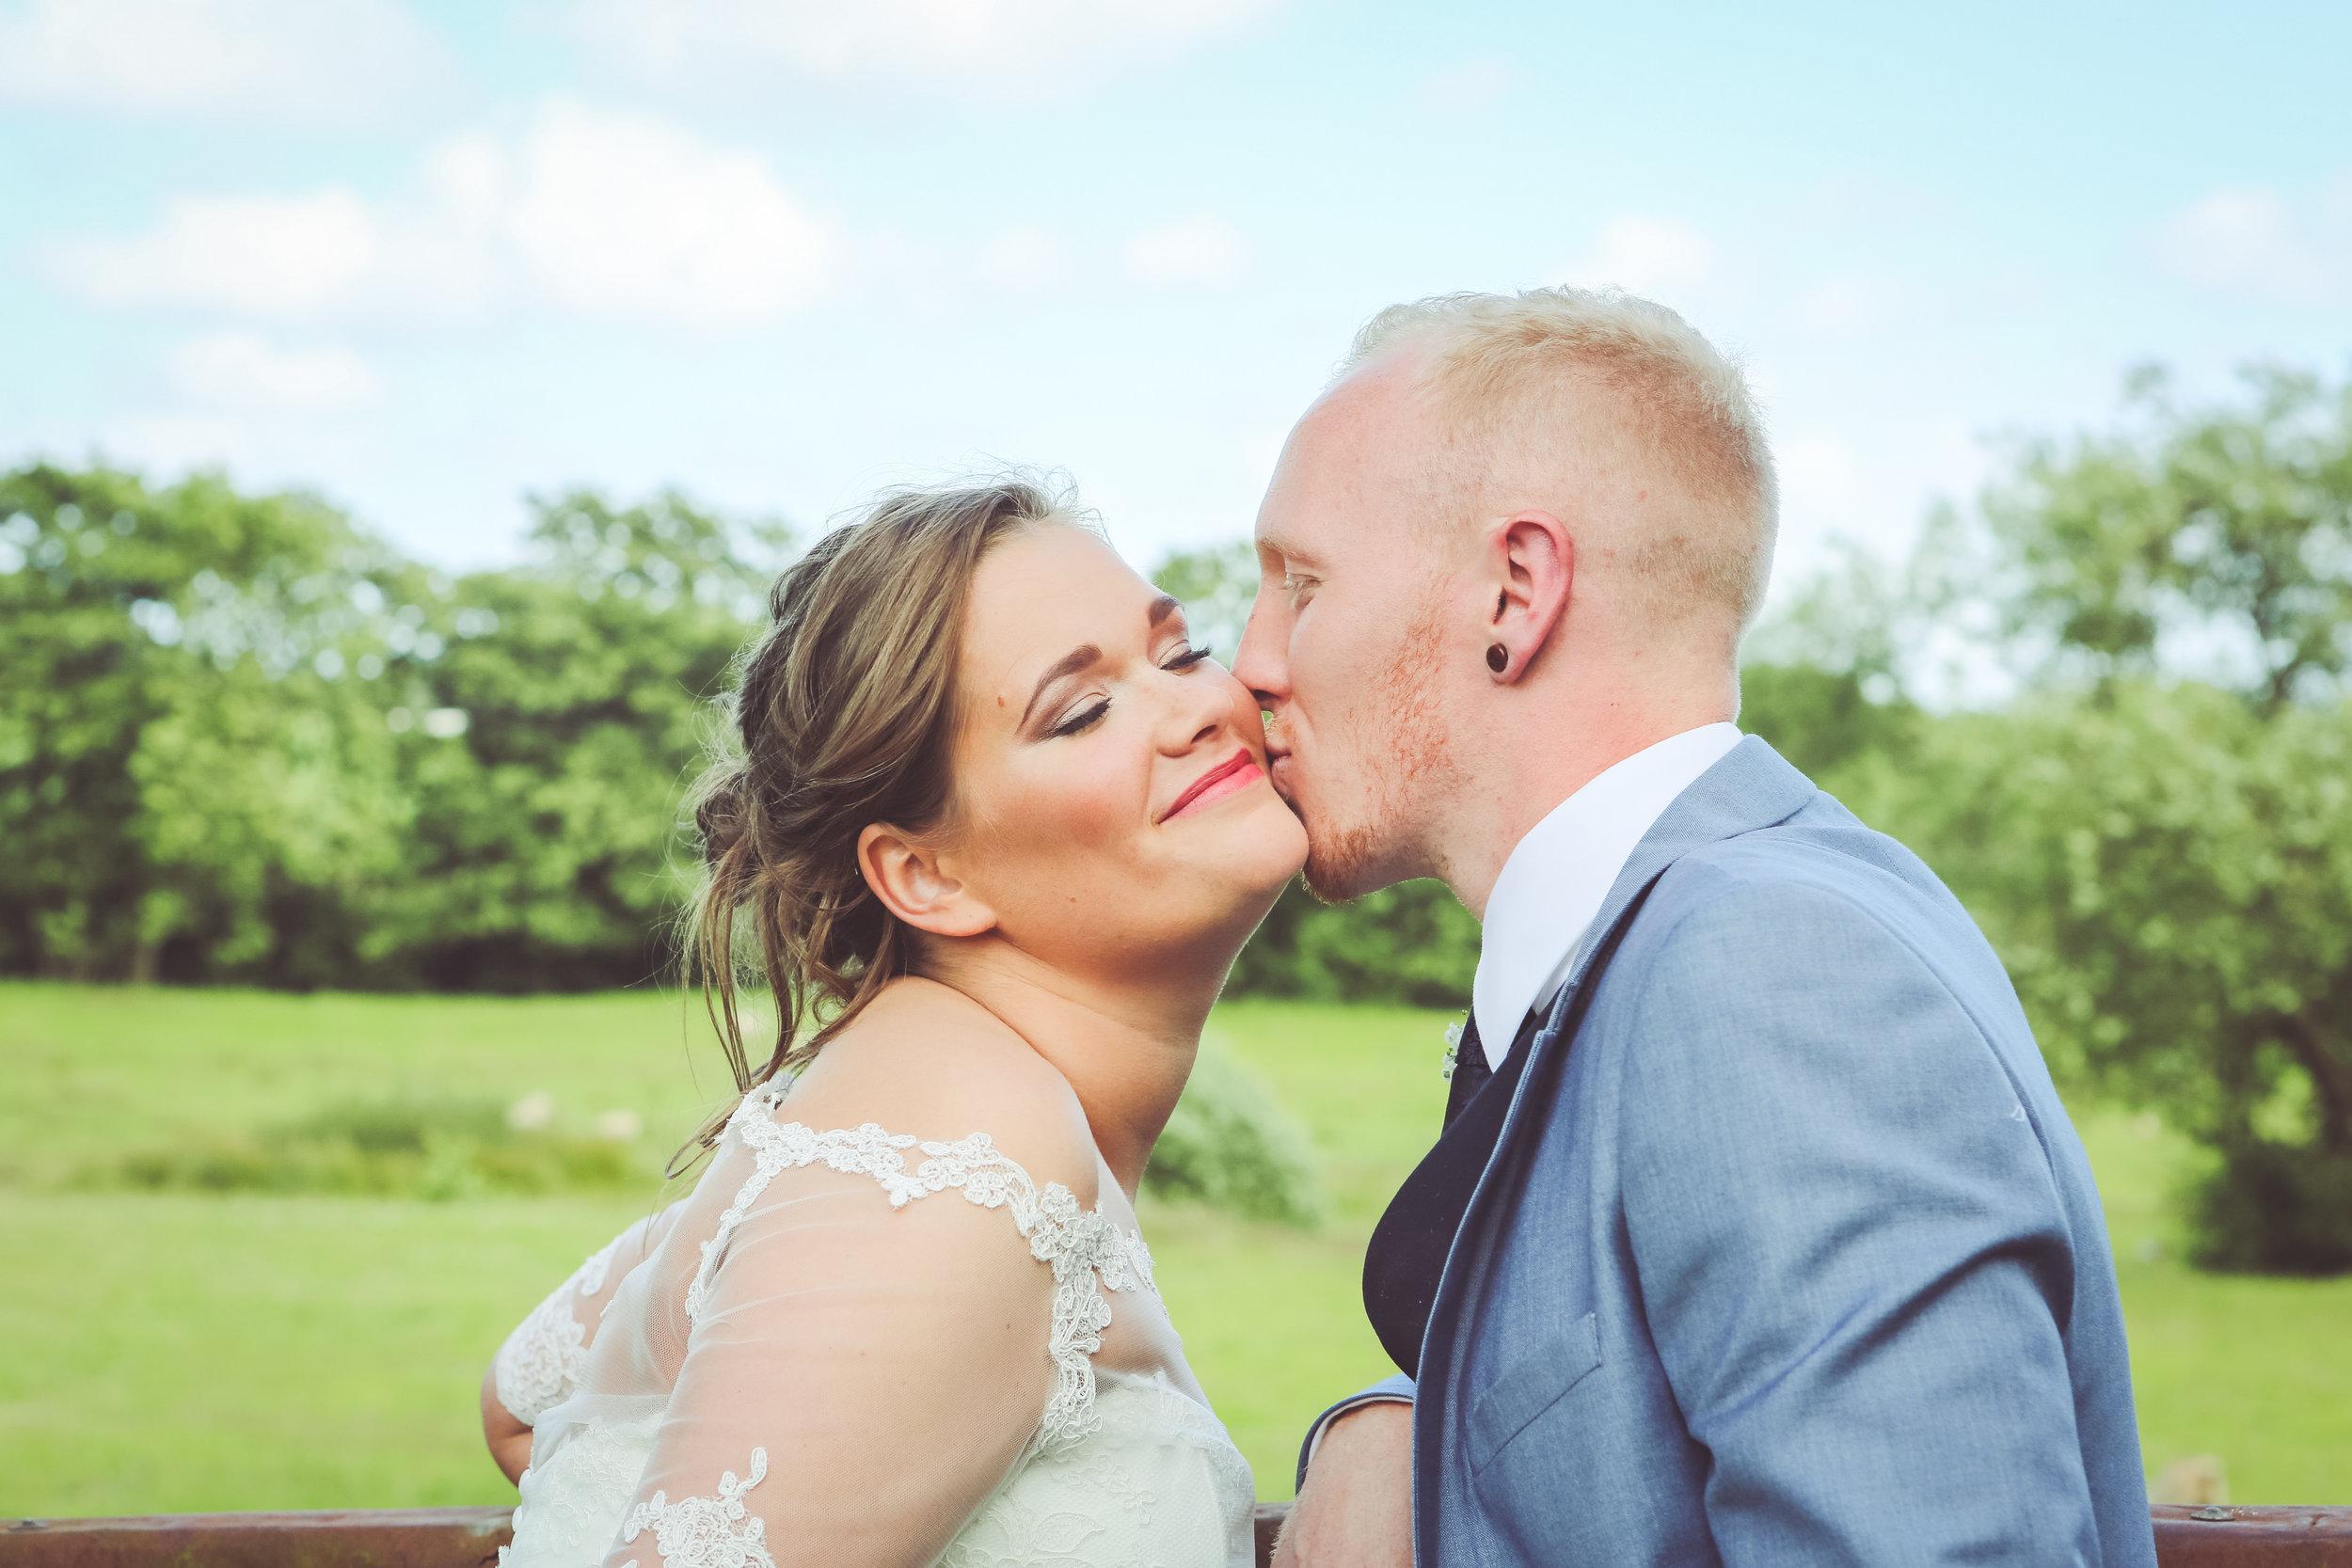 Amy & Adam Wedding - July 2nd 2016 Sussex BarnAmy & Adam Wedding - Sussex BarnFRNH2209.jpg